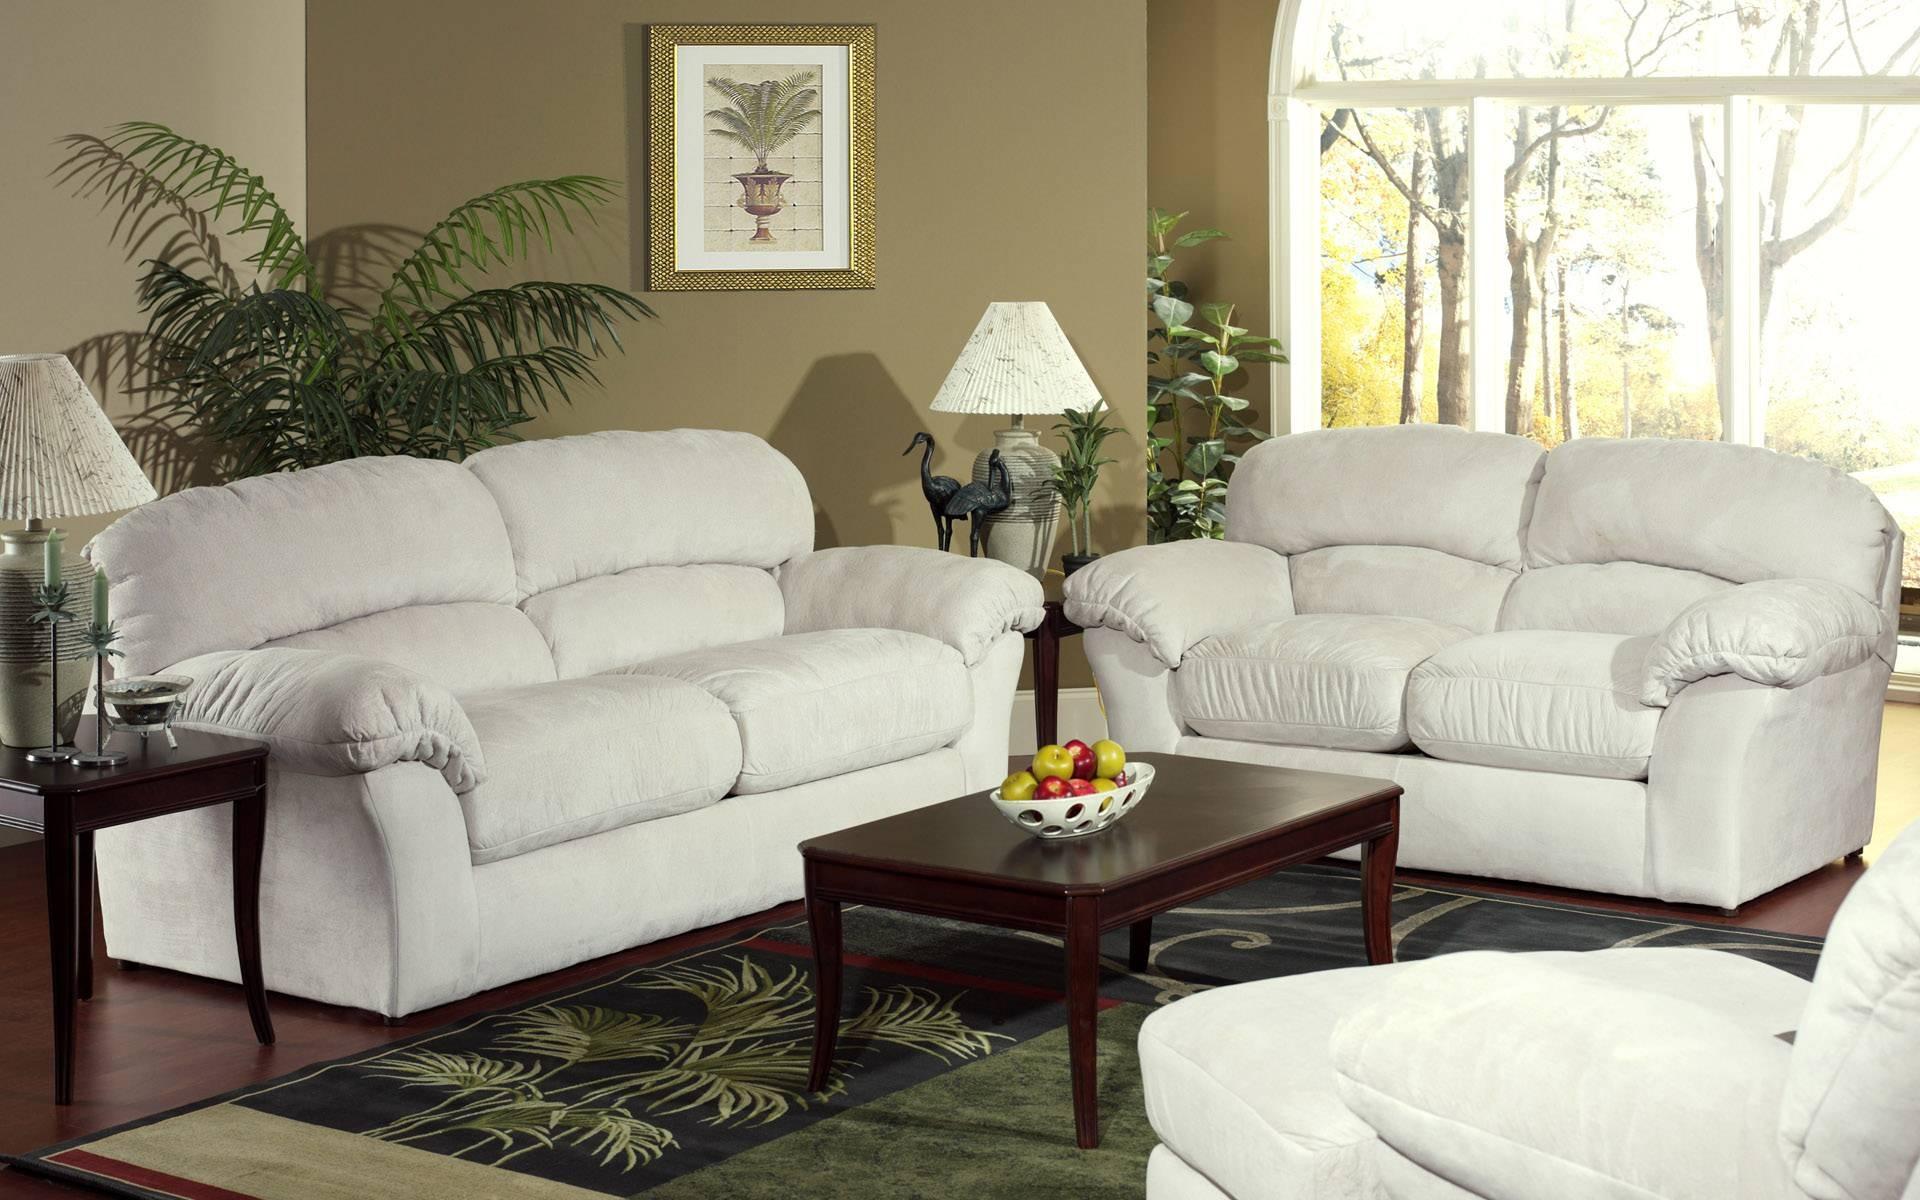 Living Room White Sofa Set Living Room On Living Room In White throughout Living Room Sofa Chairs (Image 10 of 15)